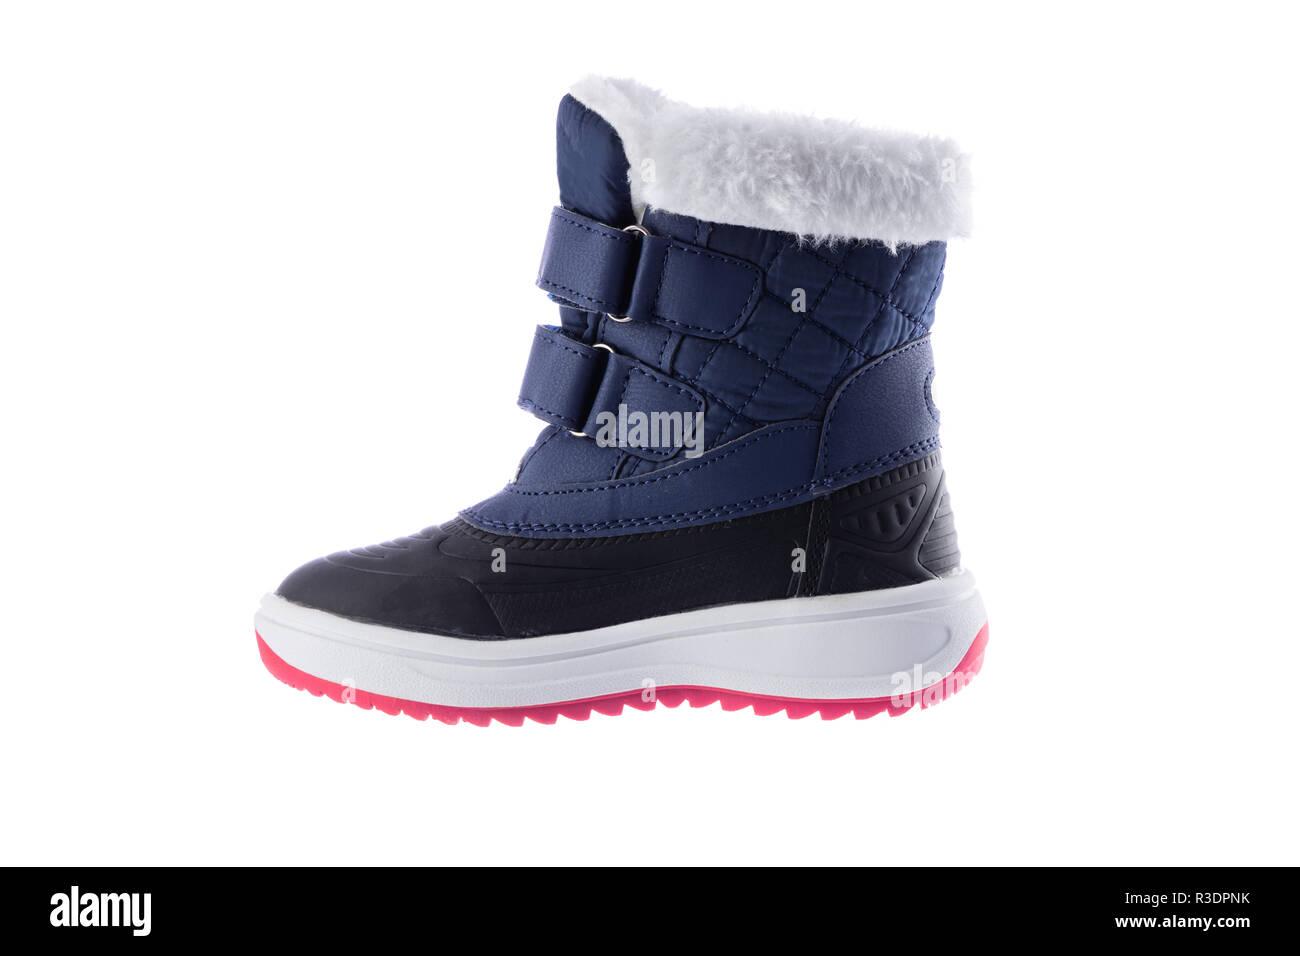 509e06fb8e Boots for winter season